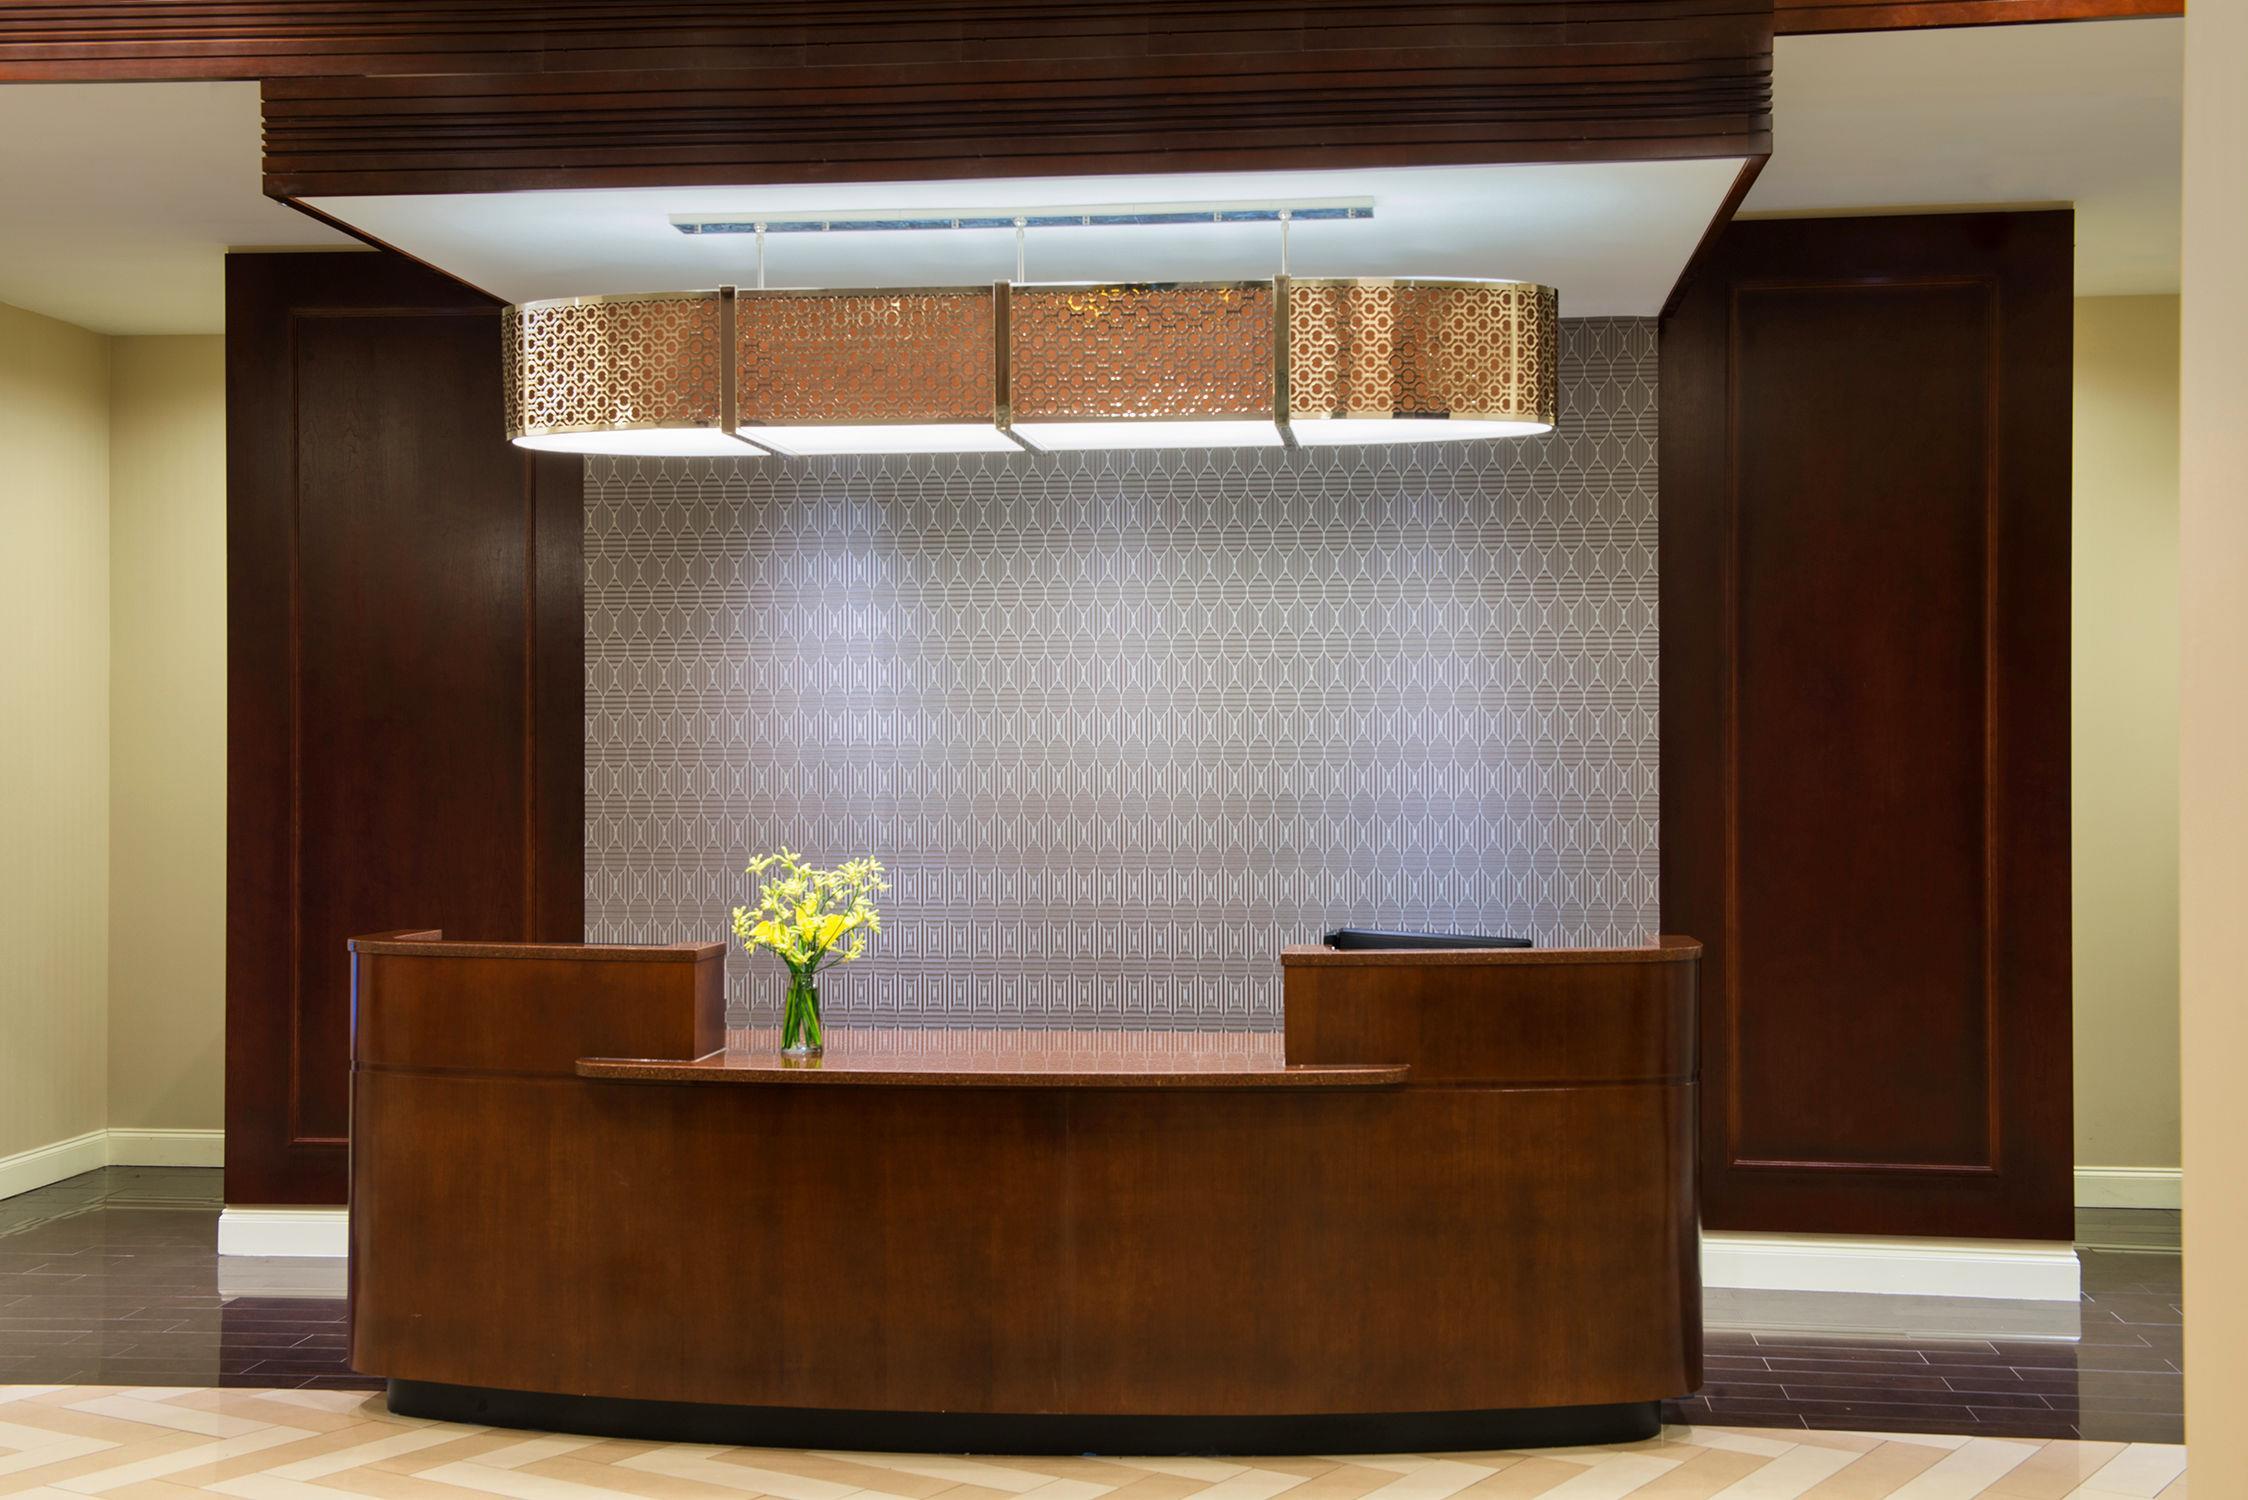 Sheraton Wilmington South Hotel image 2